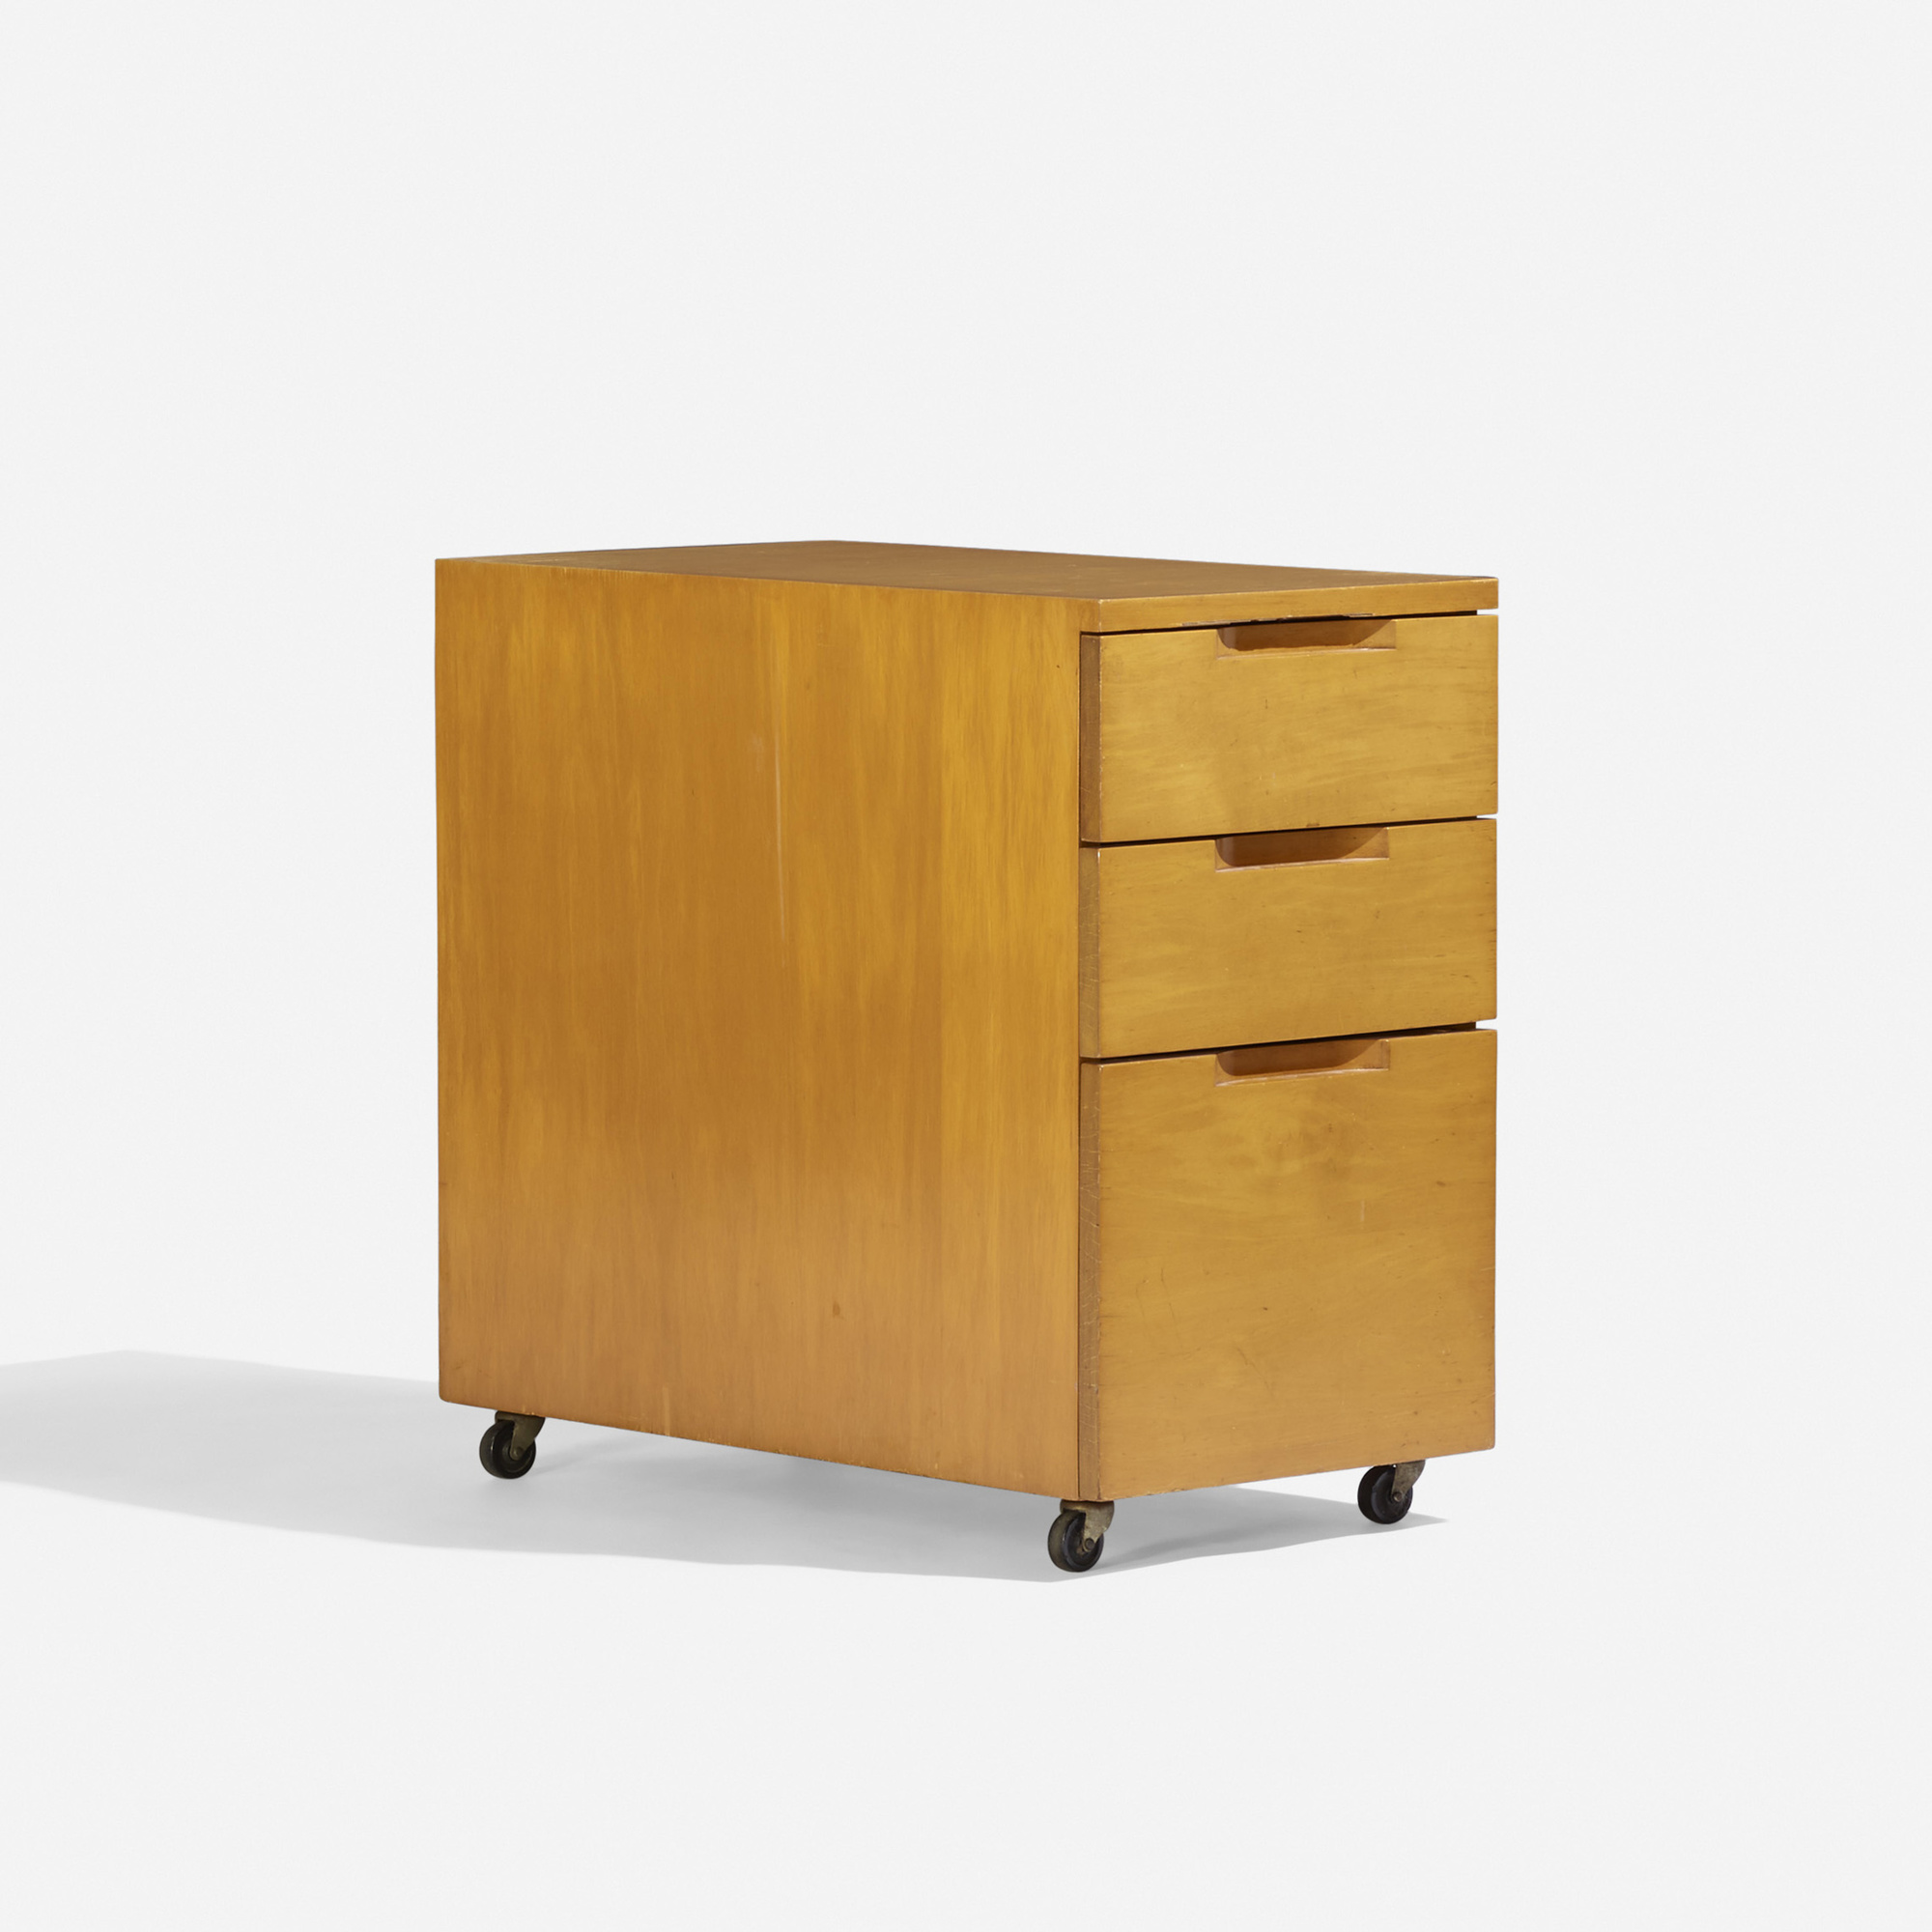 102: Alvar Aalto / cabinet (1 of 1)